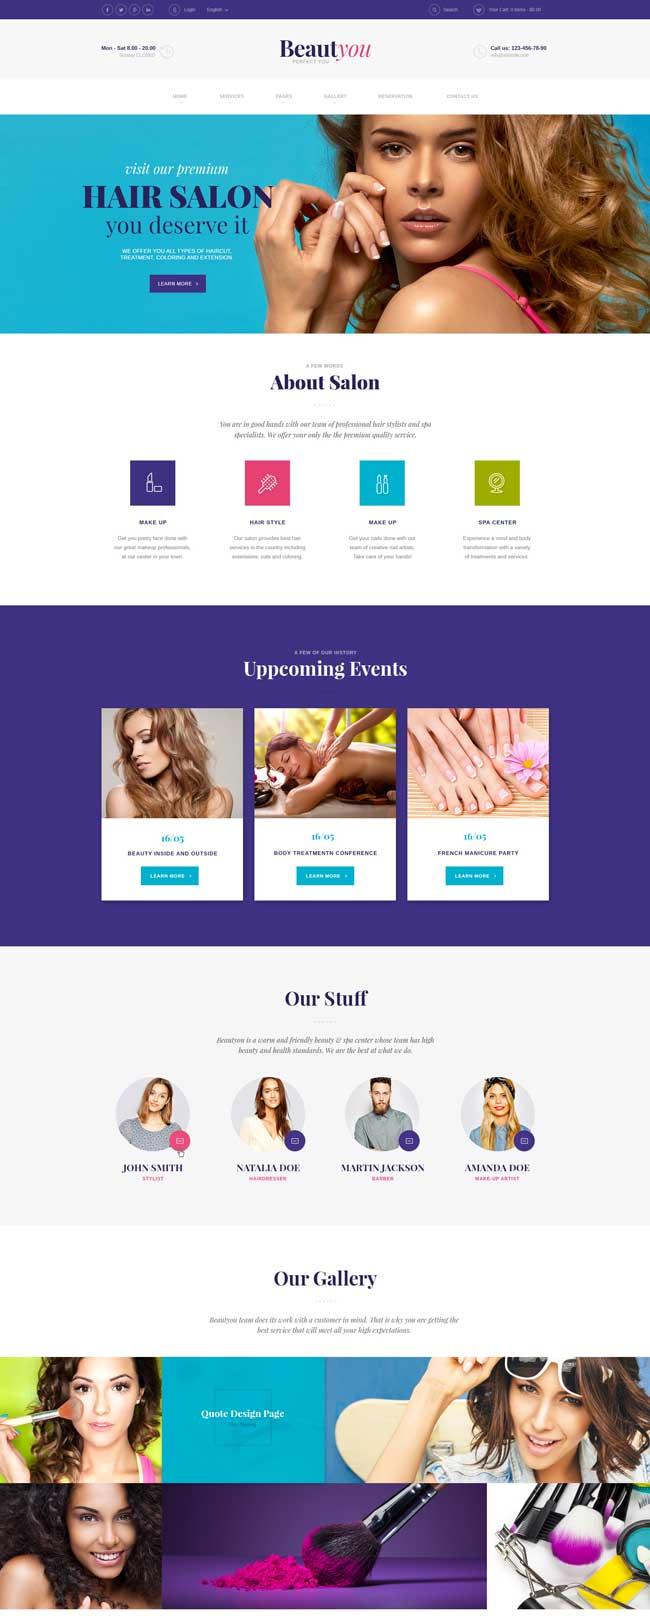 30 best spa beauty salon wordpress themes 2017 designmaz for A fresh start beauty salon